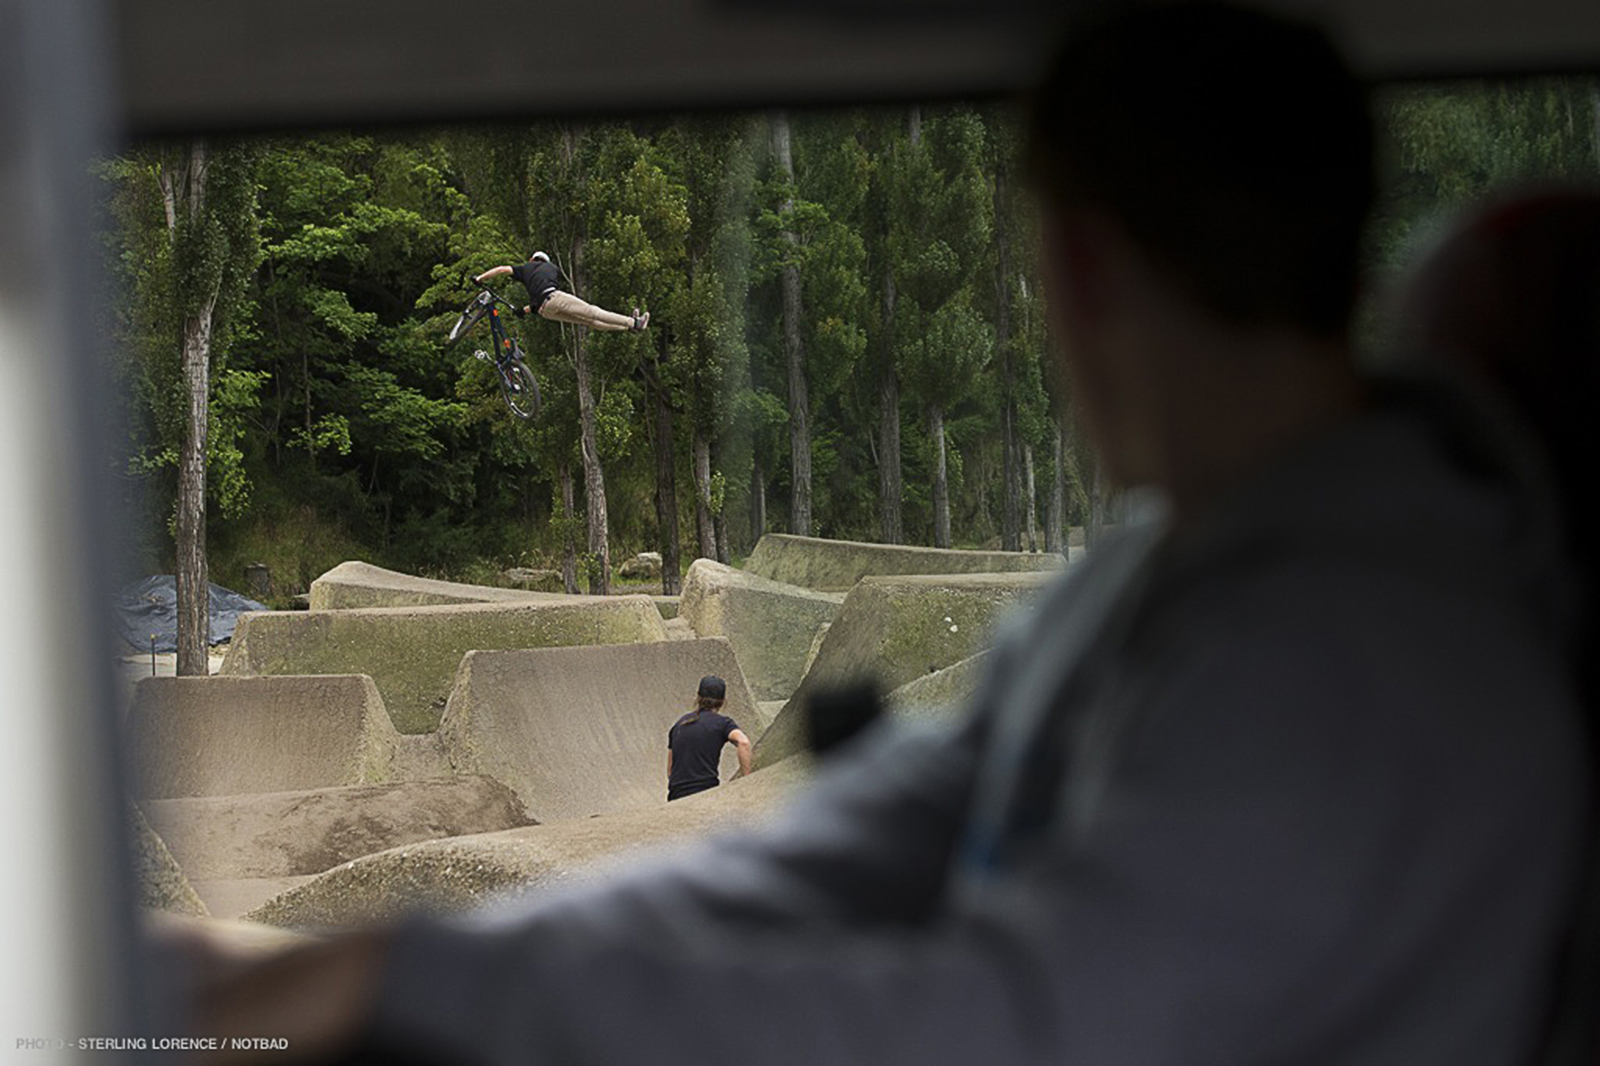 Gorge Road Dirt Jumps near Queenstown, New Zealand.